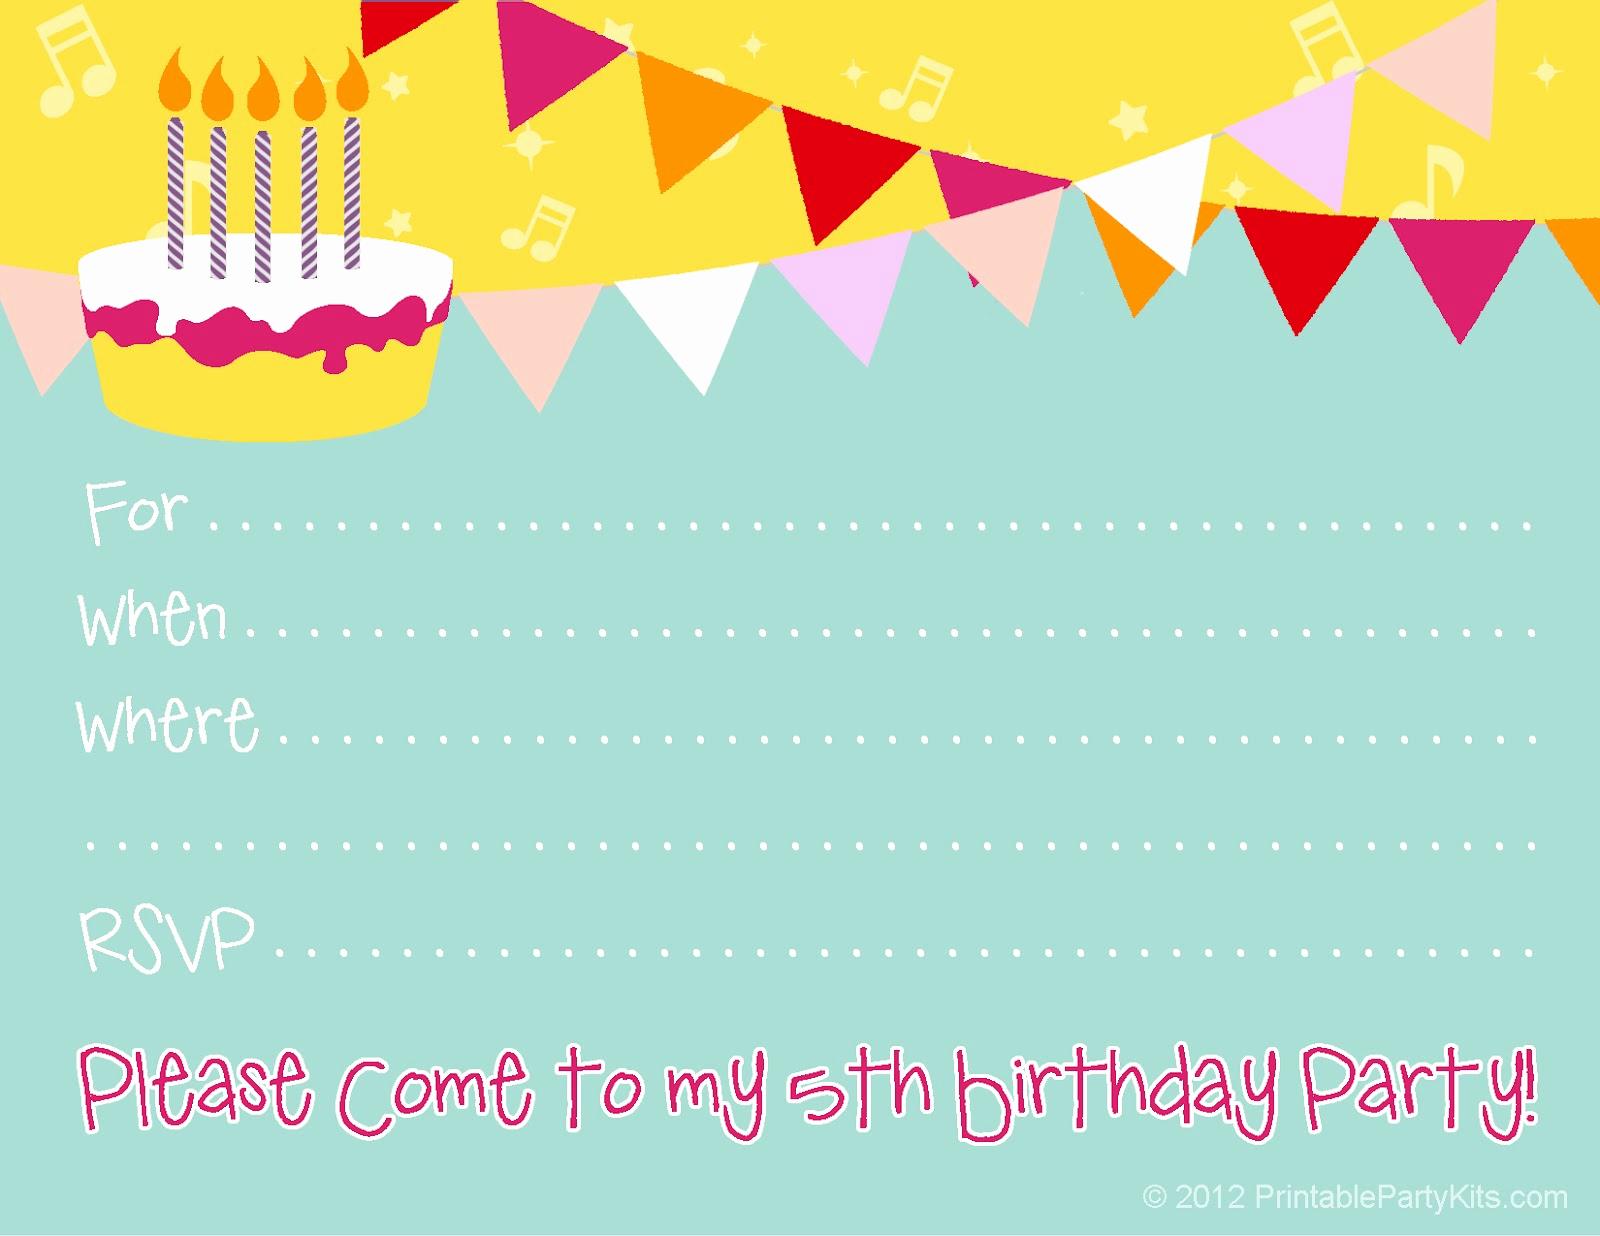 Kids Birthday Party Invitation Template Inspirational Free Birthday Party Invitations for Girl – Free Printable